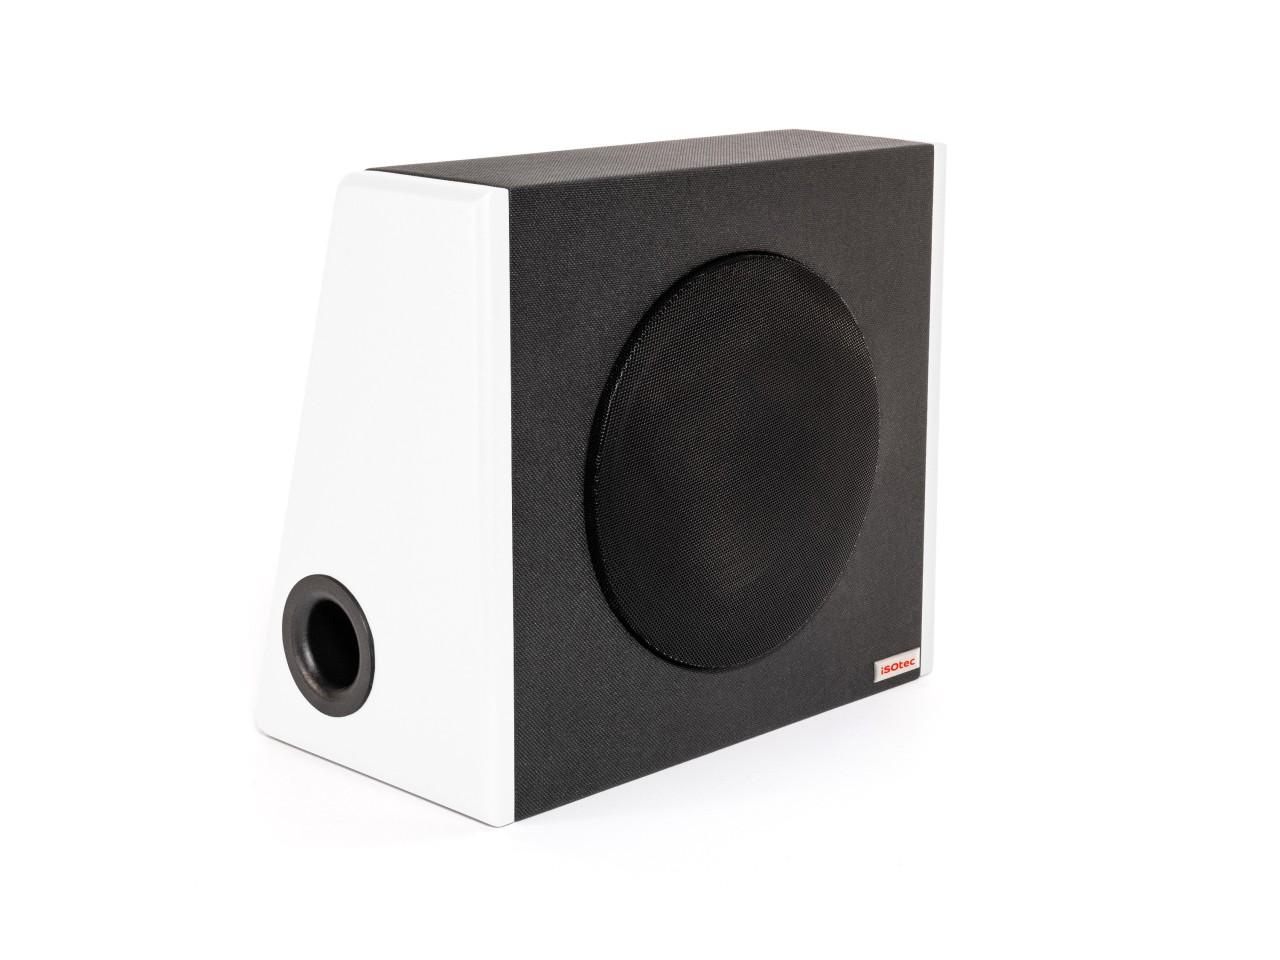 SUB c | Kofferraum Woofer | 20cm 120 Watt 4 Ohm | White Edition